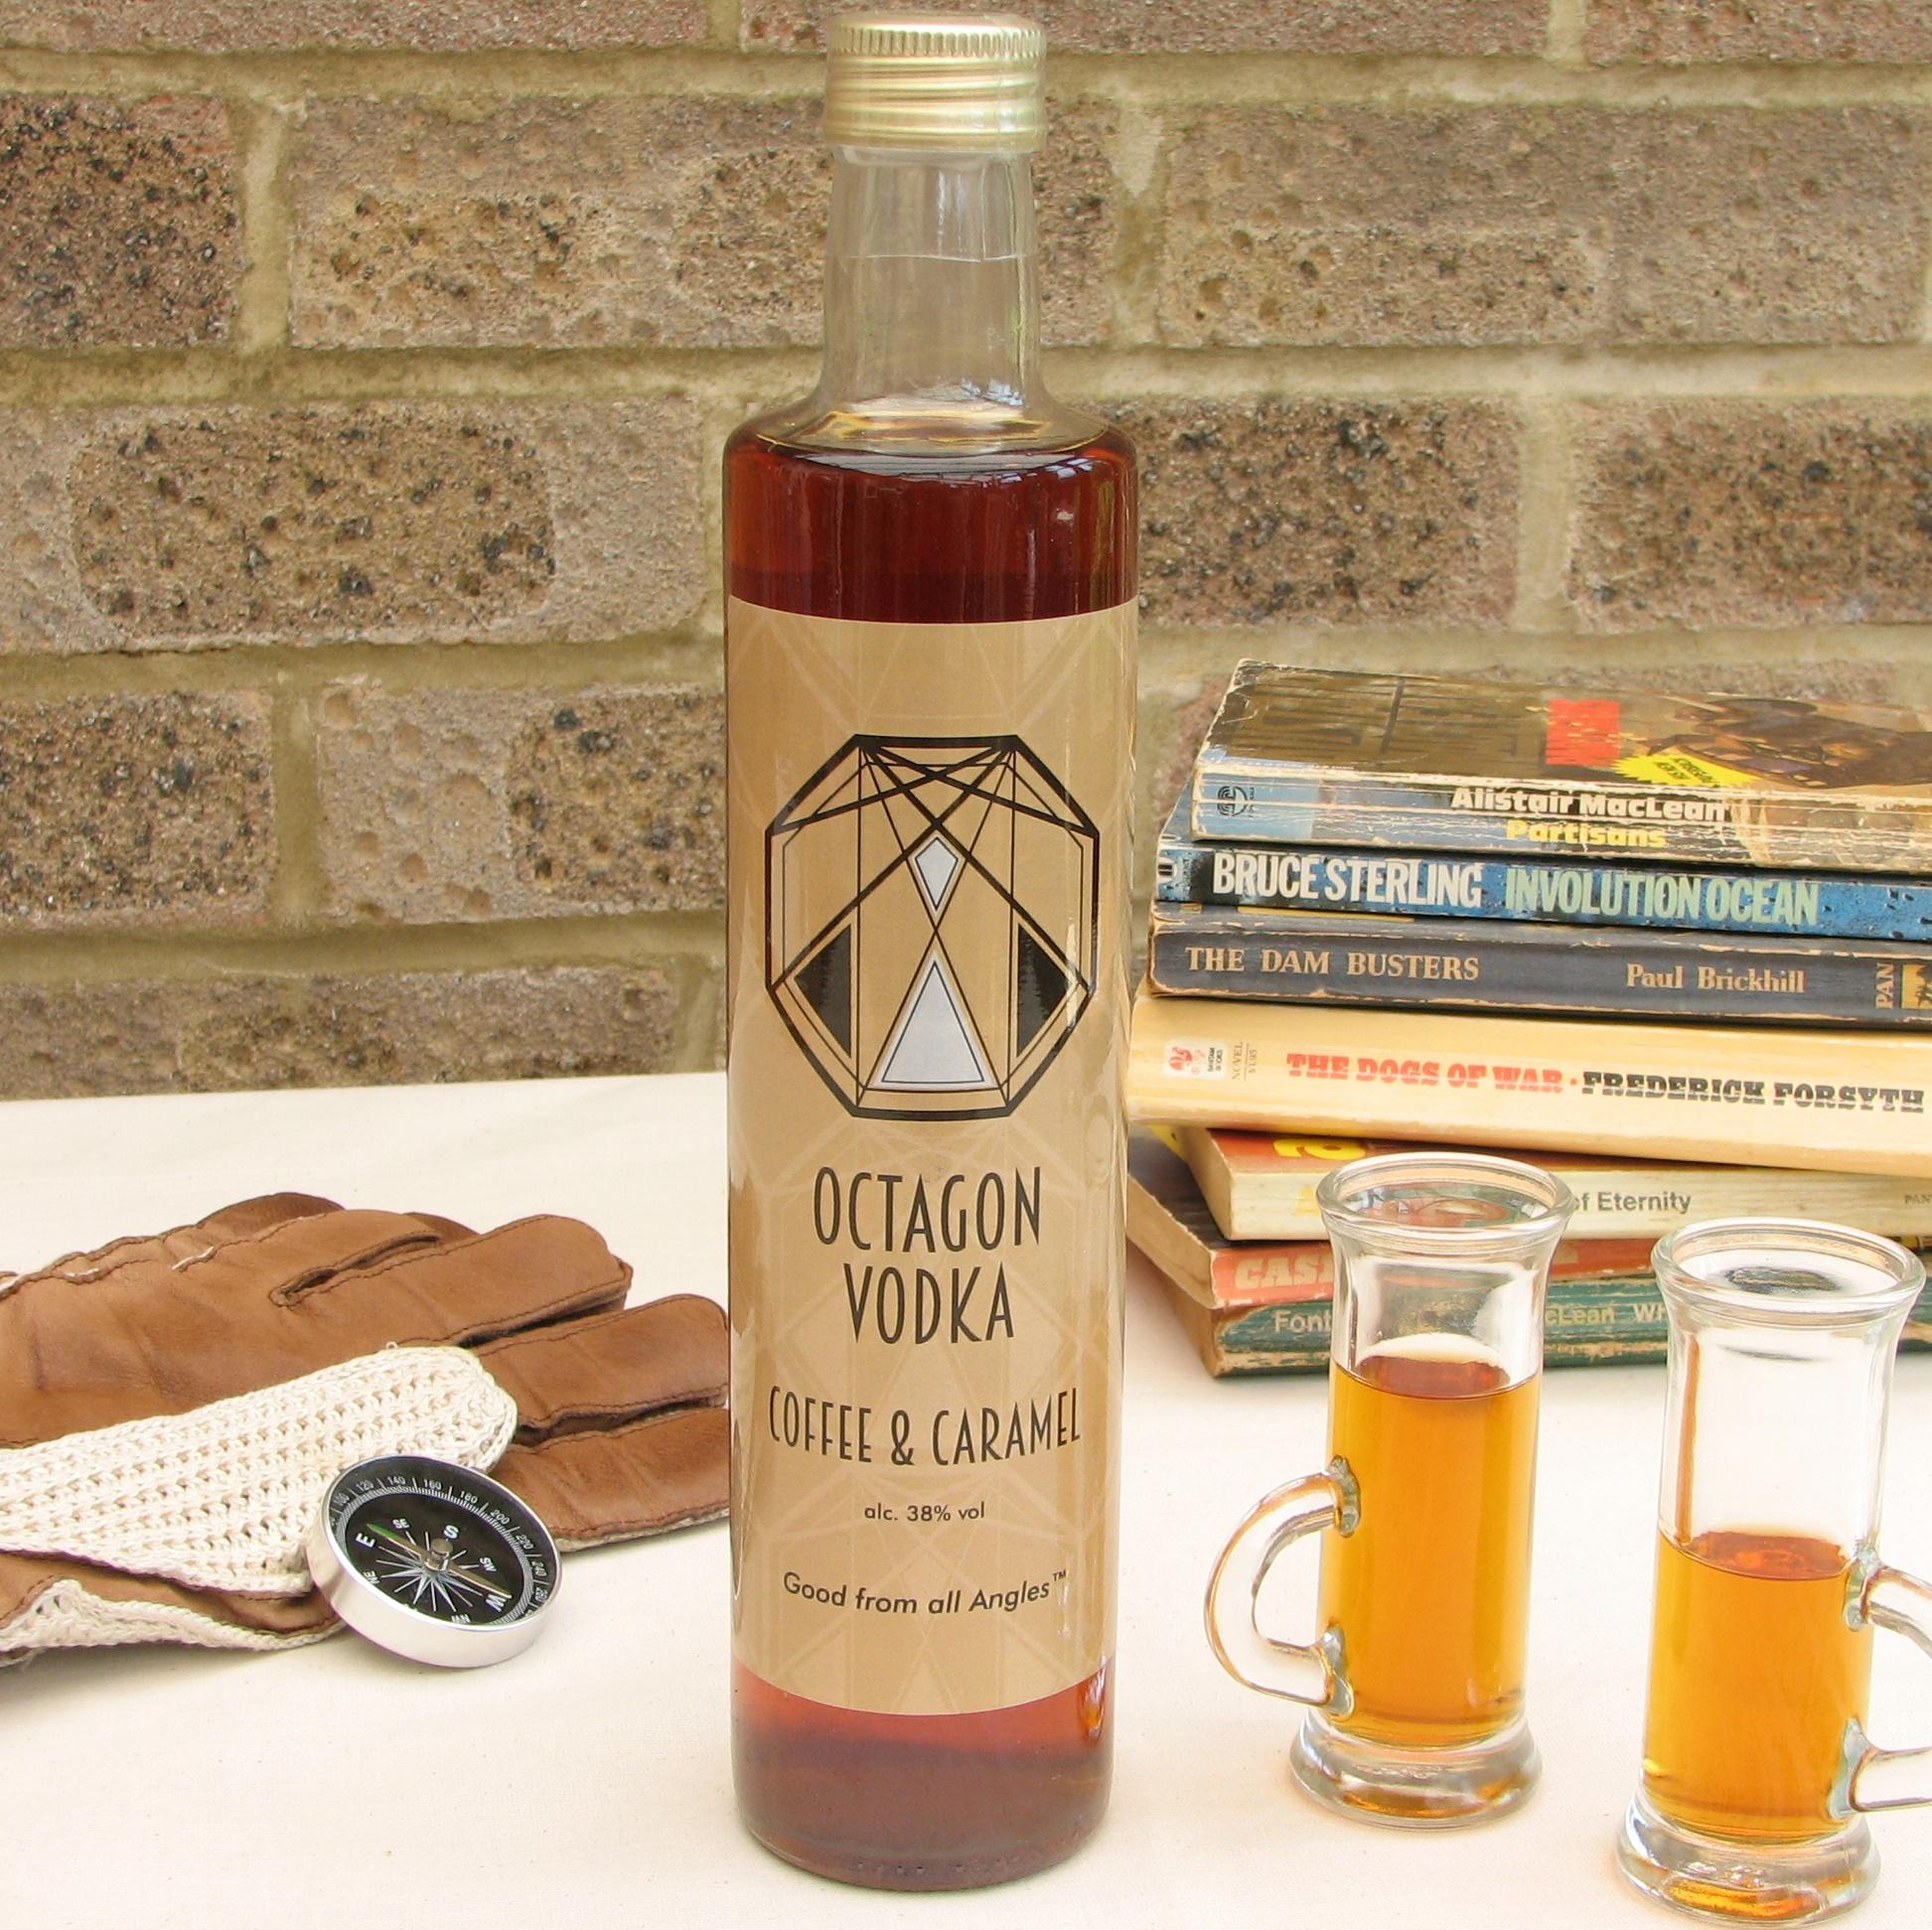 Coffee & Caramel Octagon Vodka 38% 100ml, 250ml & 500ml